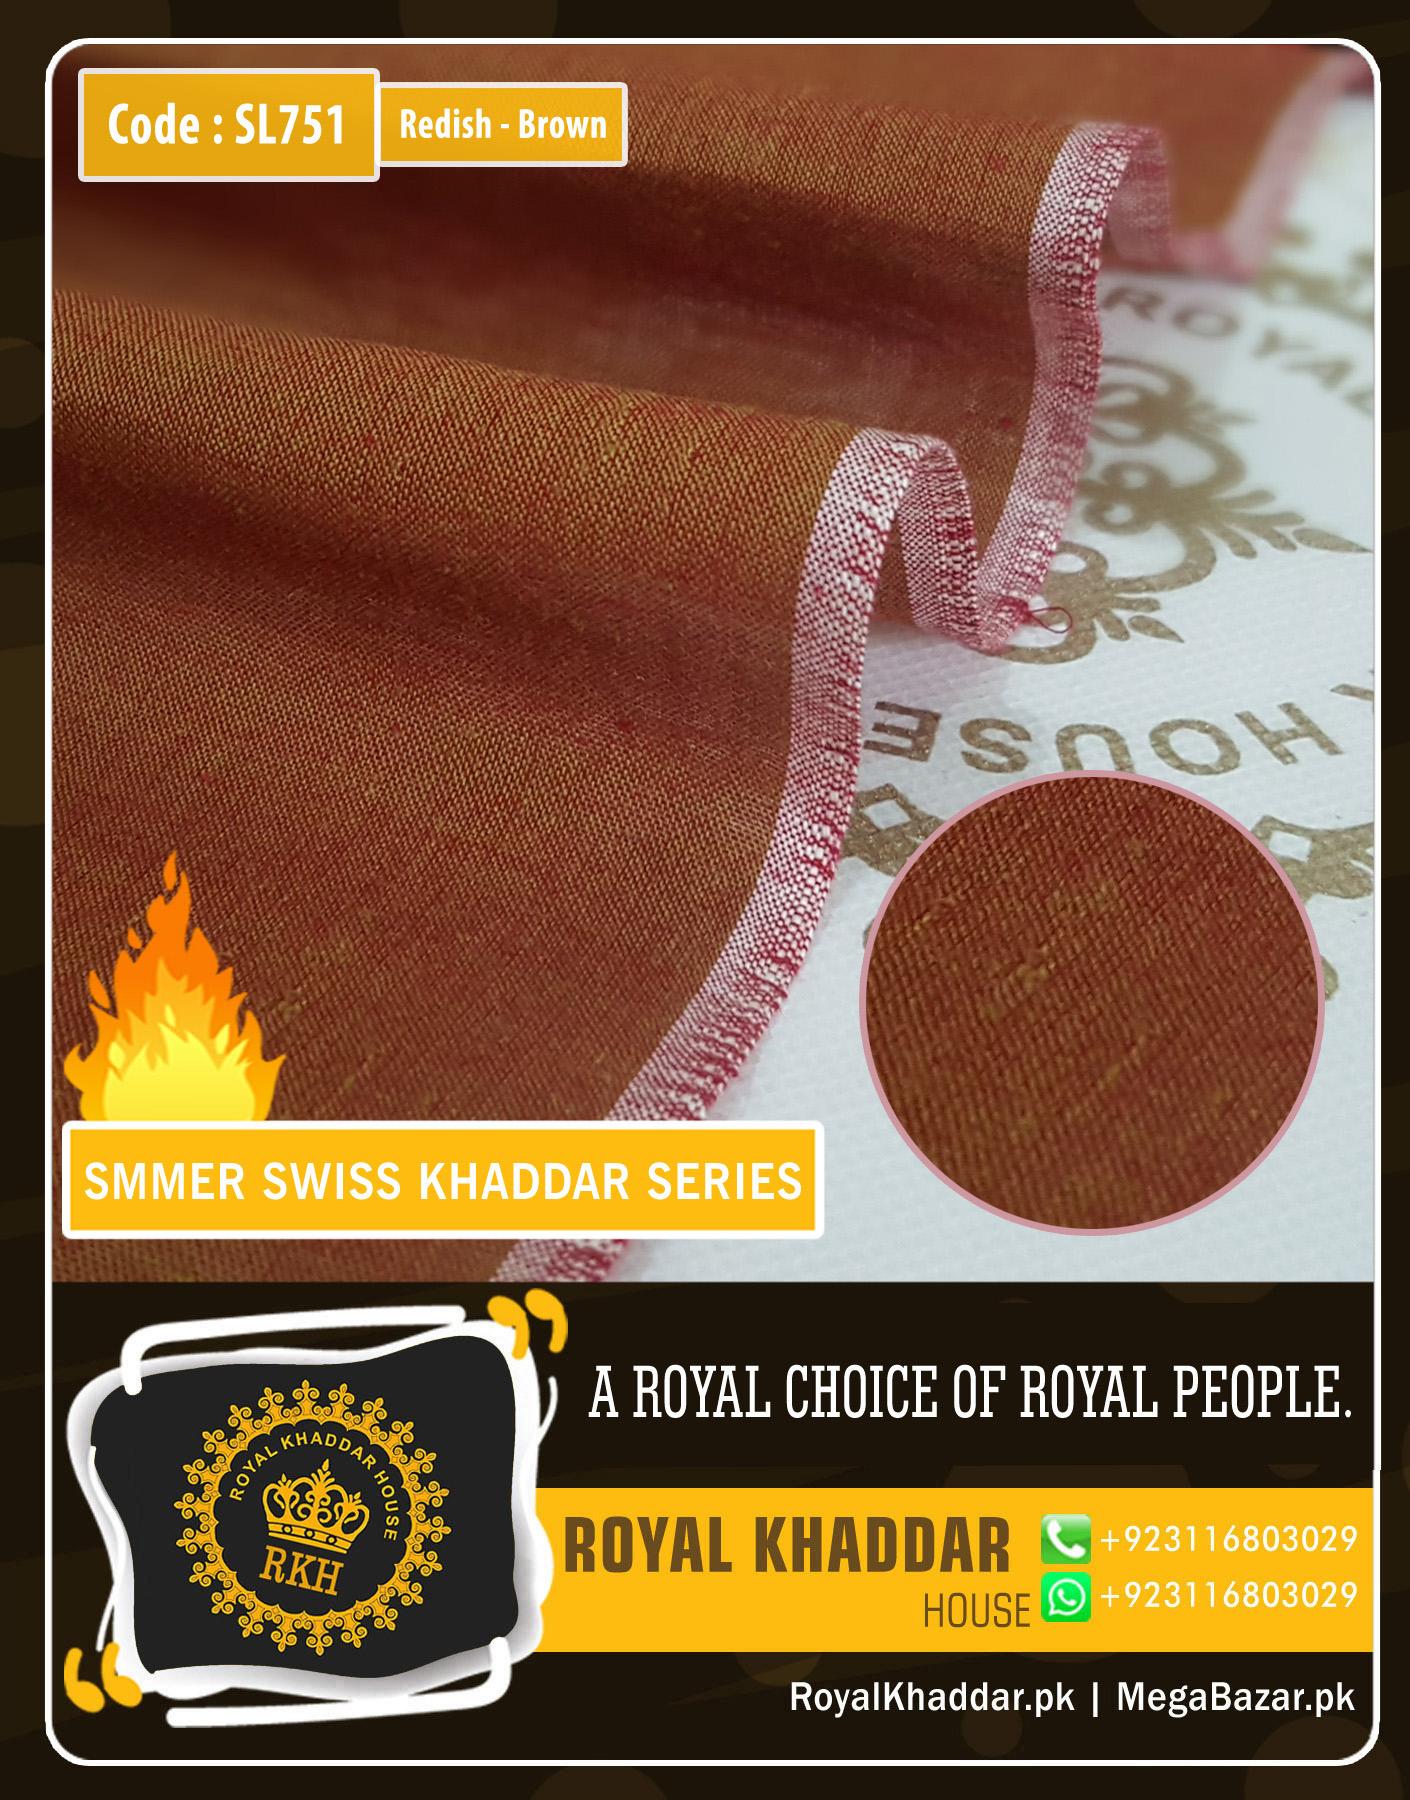 Reddish Brown Swiss Khaddar 751